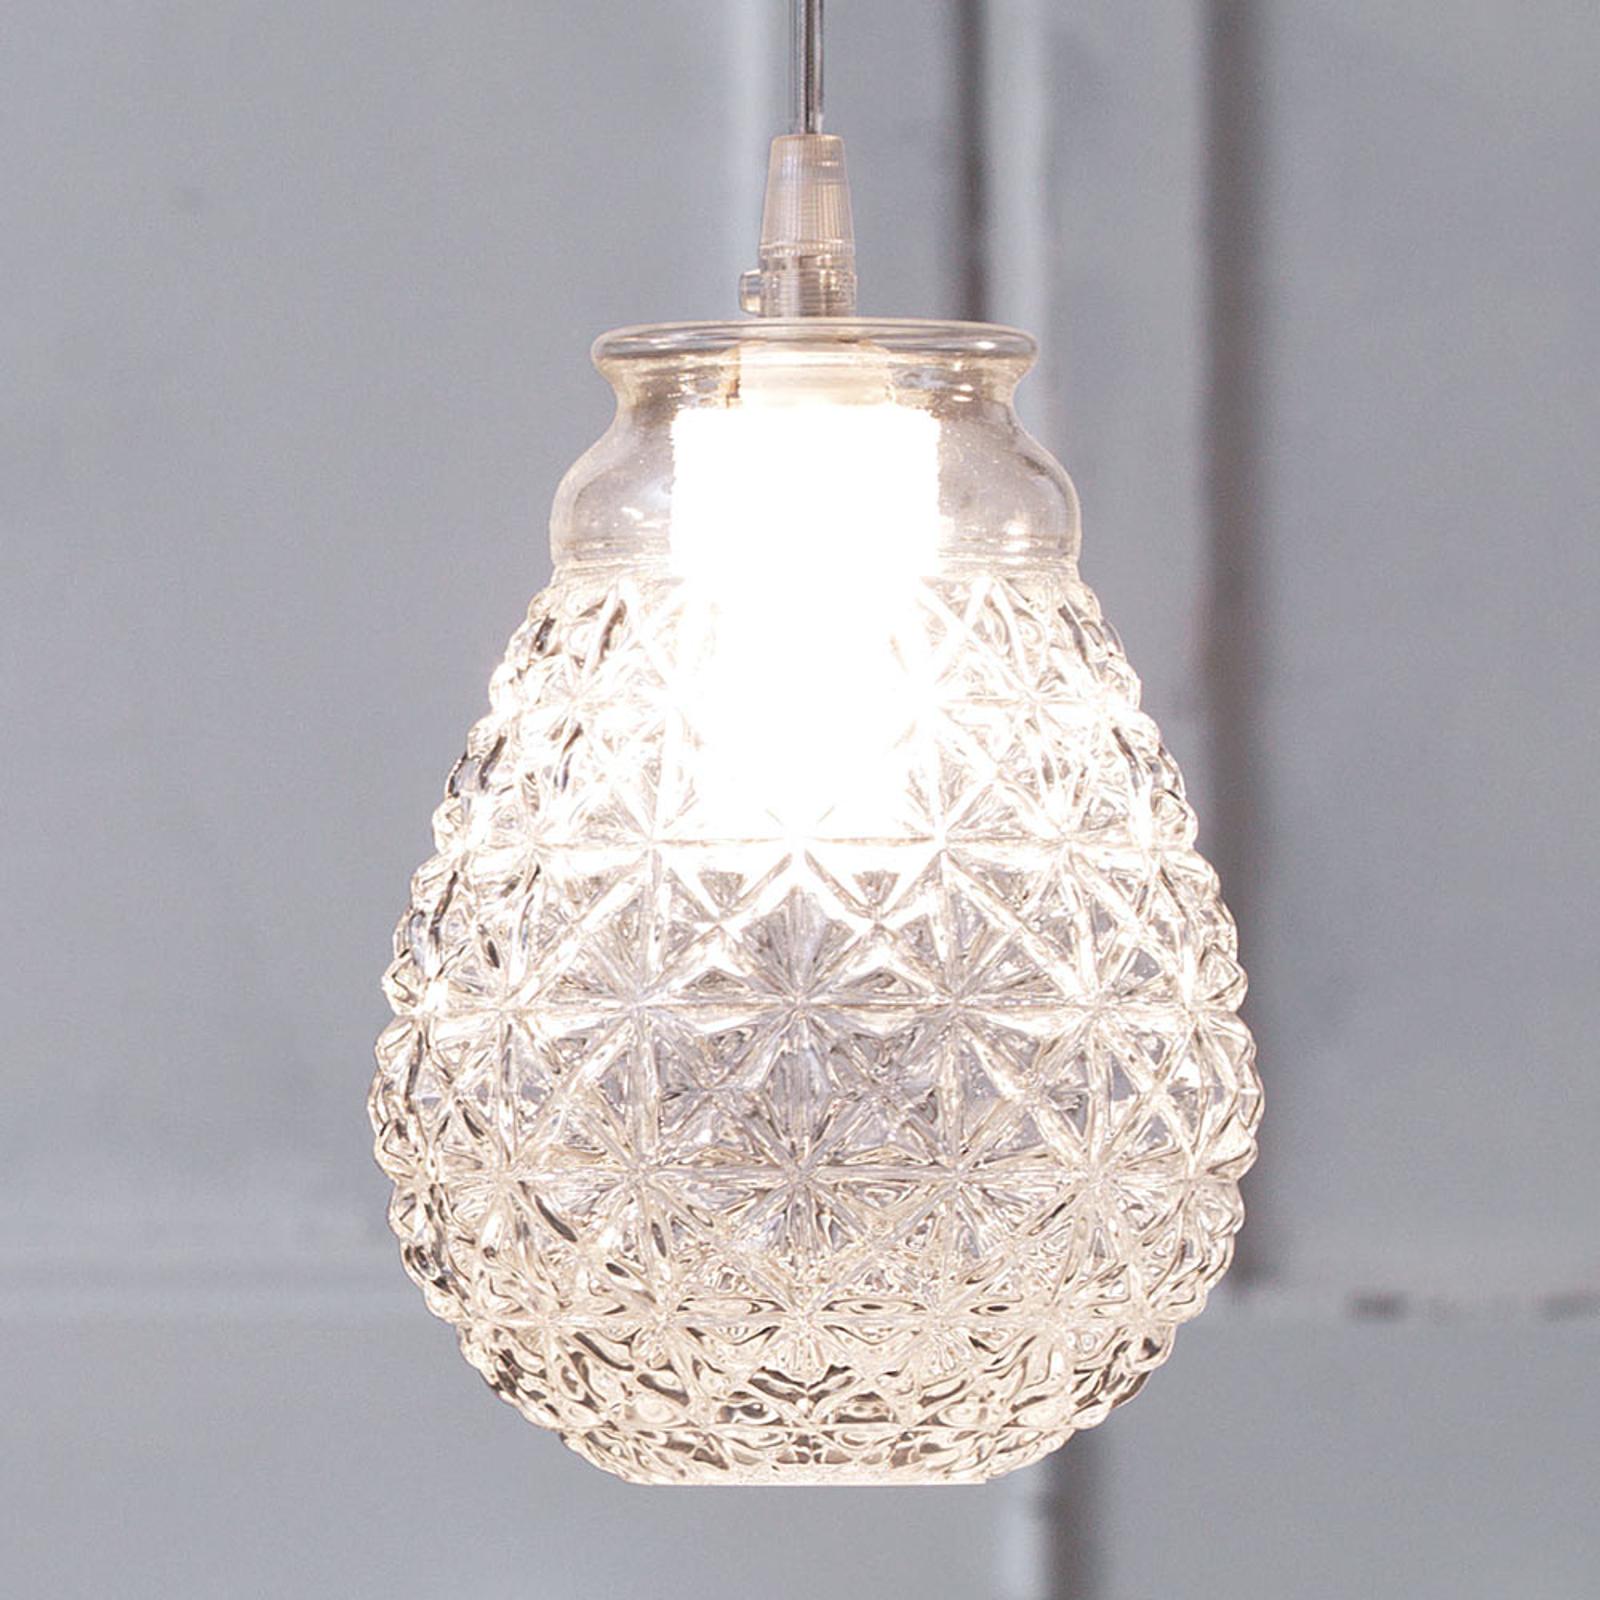 Karman Ceraunavolta szklana lampa wisząca, kropla